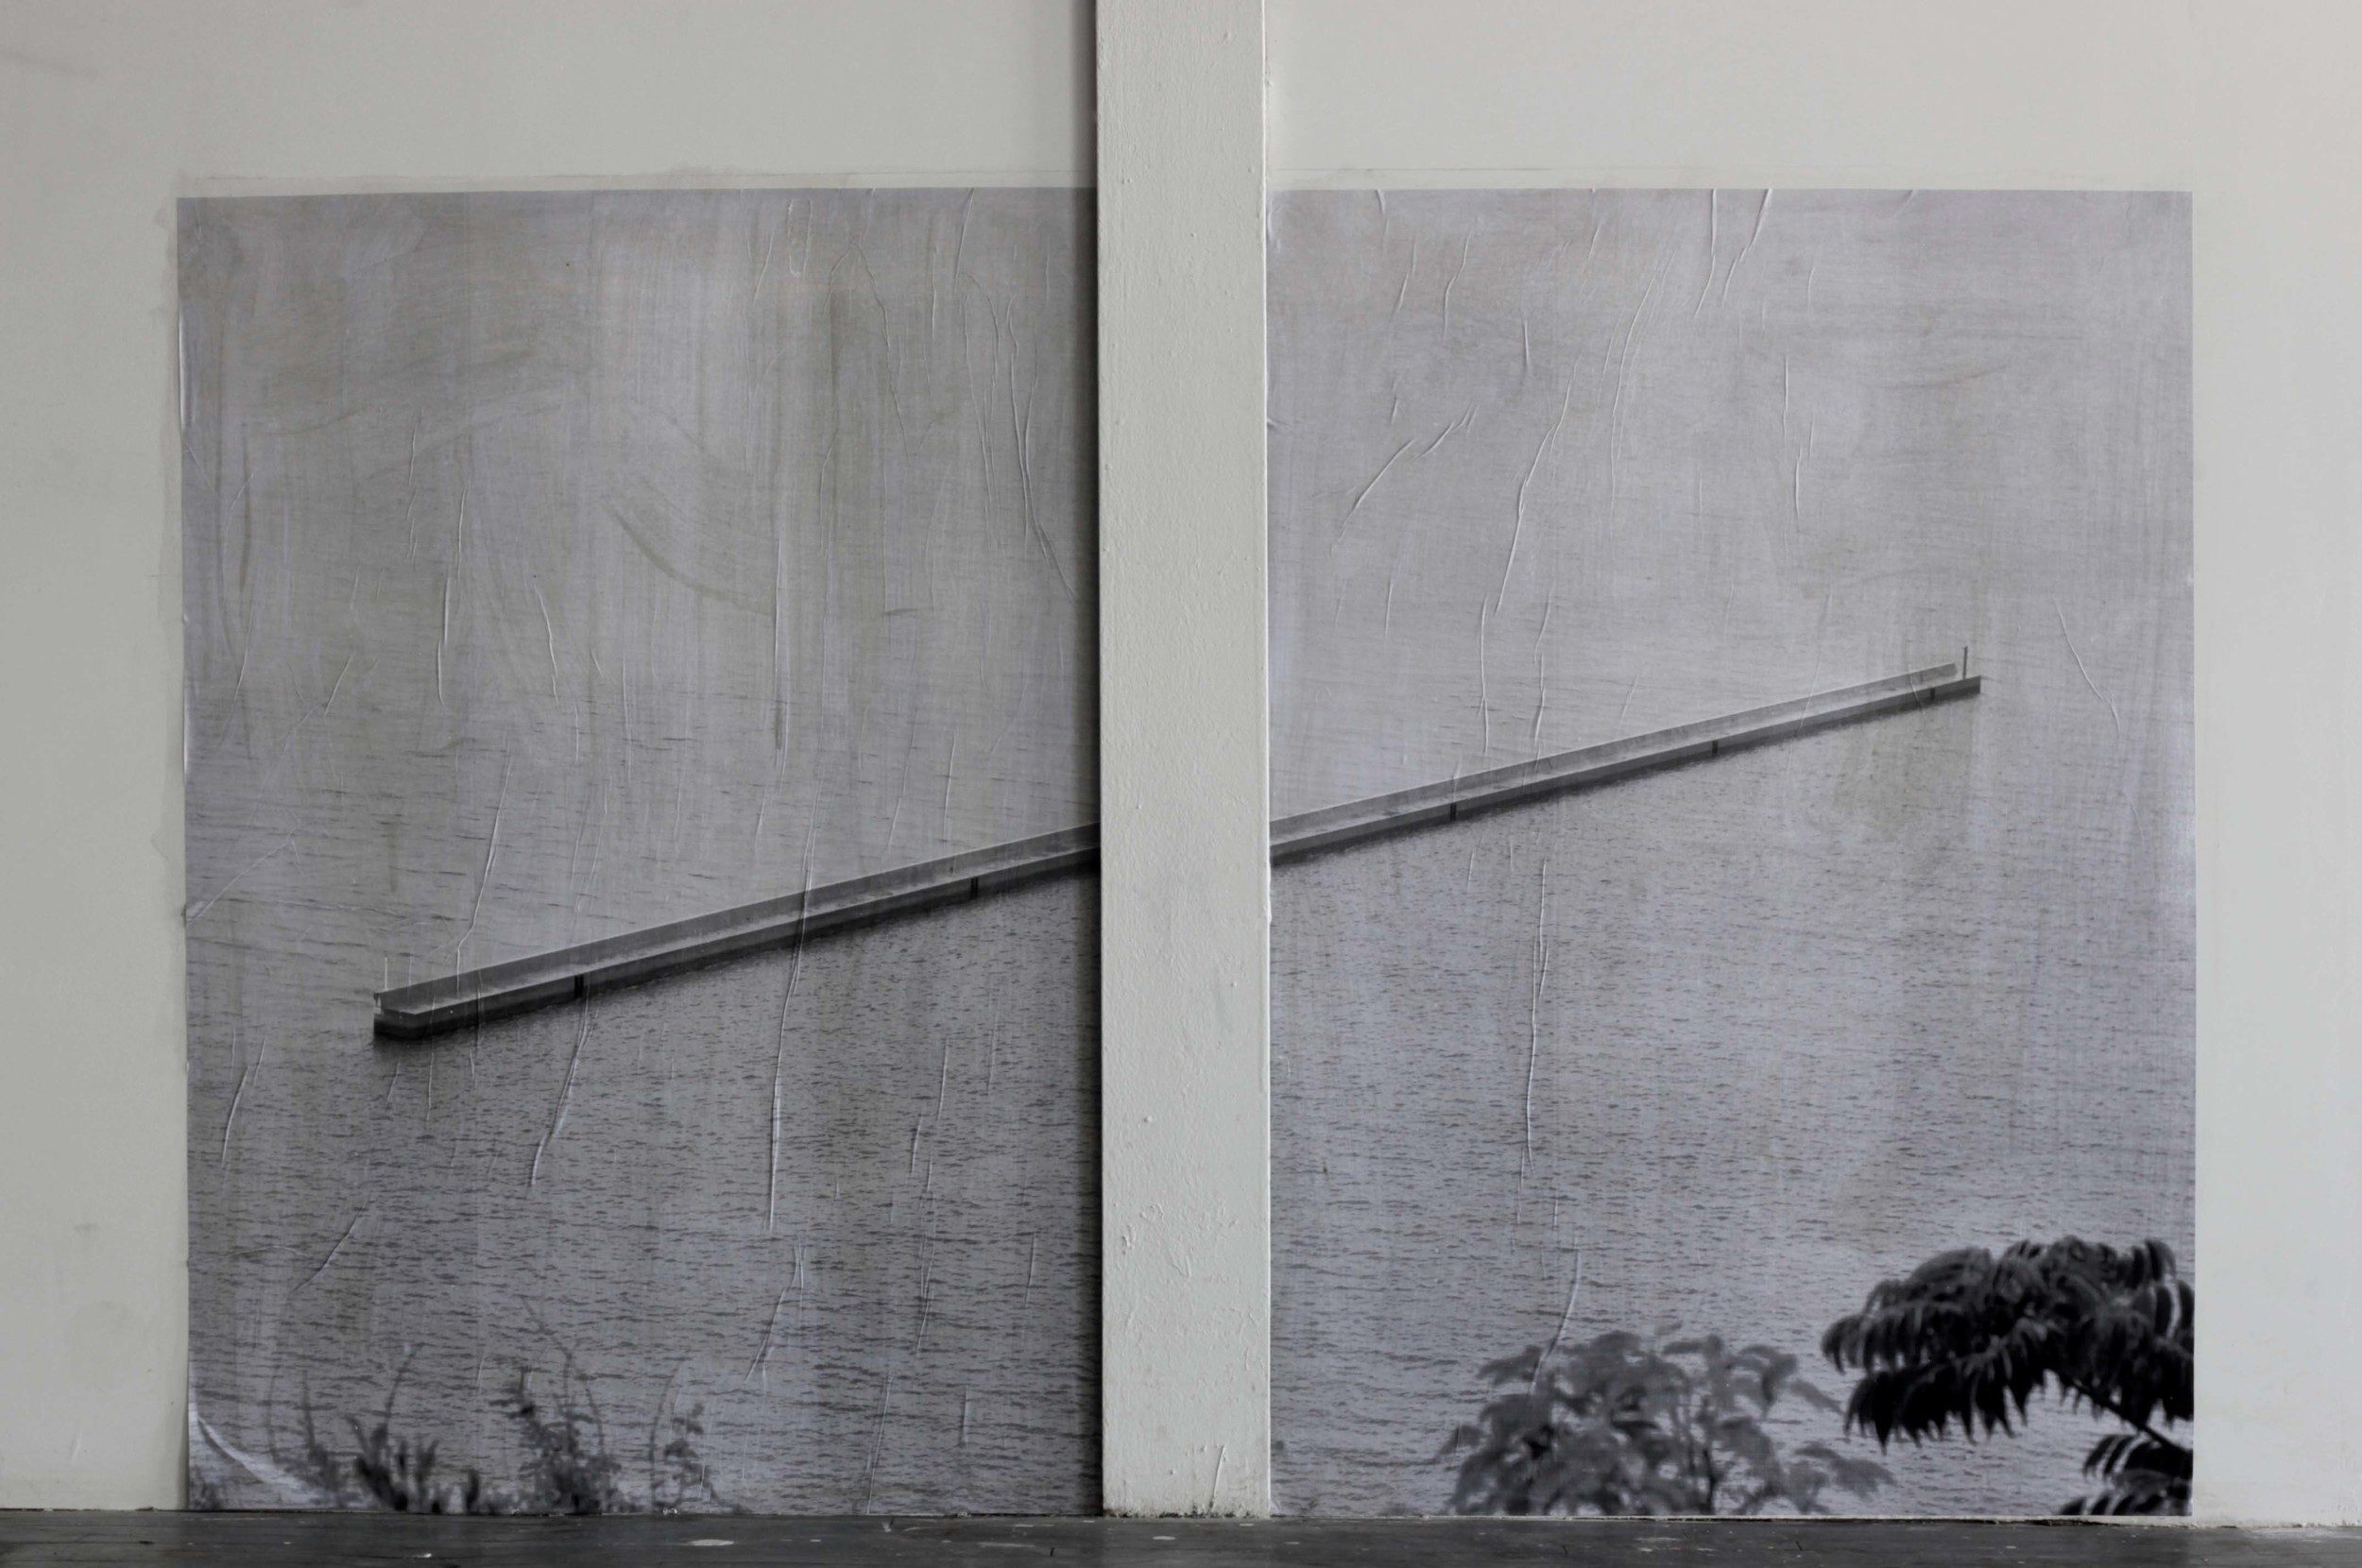 Inland, 2014 c-print pasted on wall dimensions variable  photo ©Maximiliano Siñani